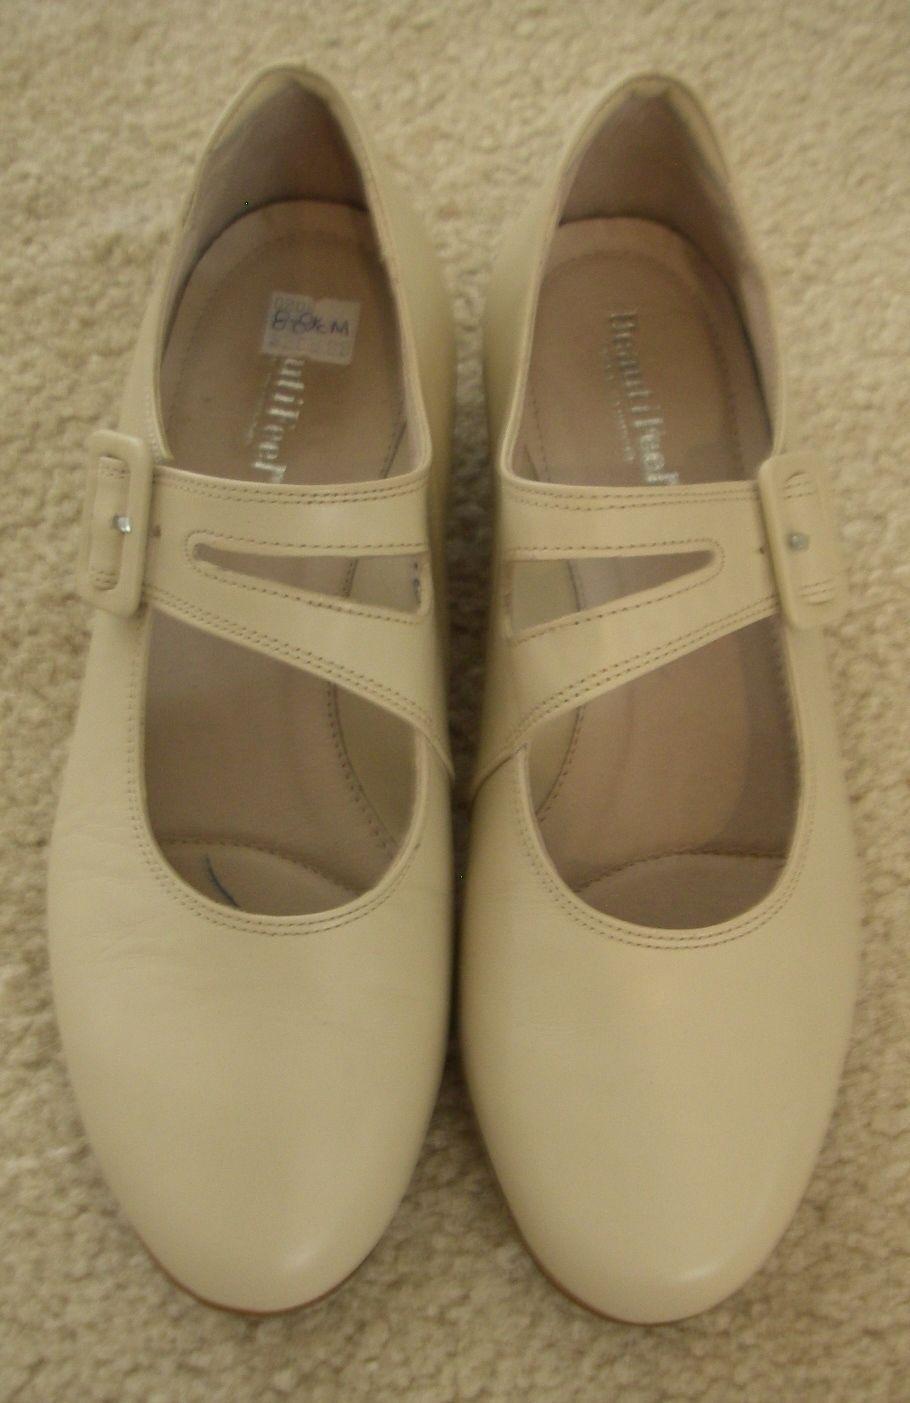 Women's Beautifeel Tara Leather Beige Heels Mary Mary Mary Jane  NWOB $290  Sz. 8 - 8.5 M 941b1a